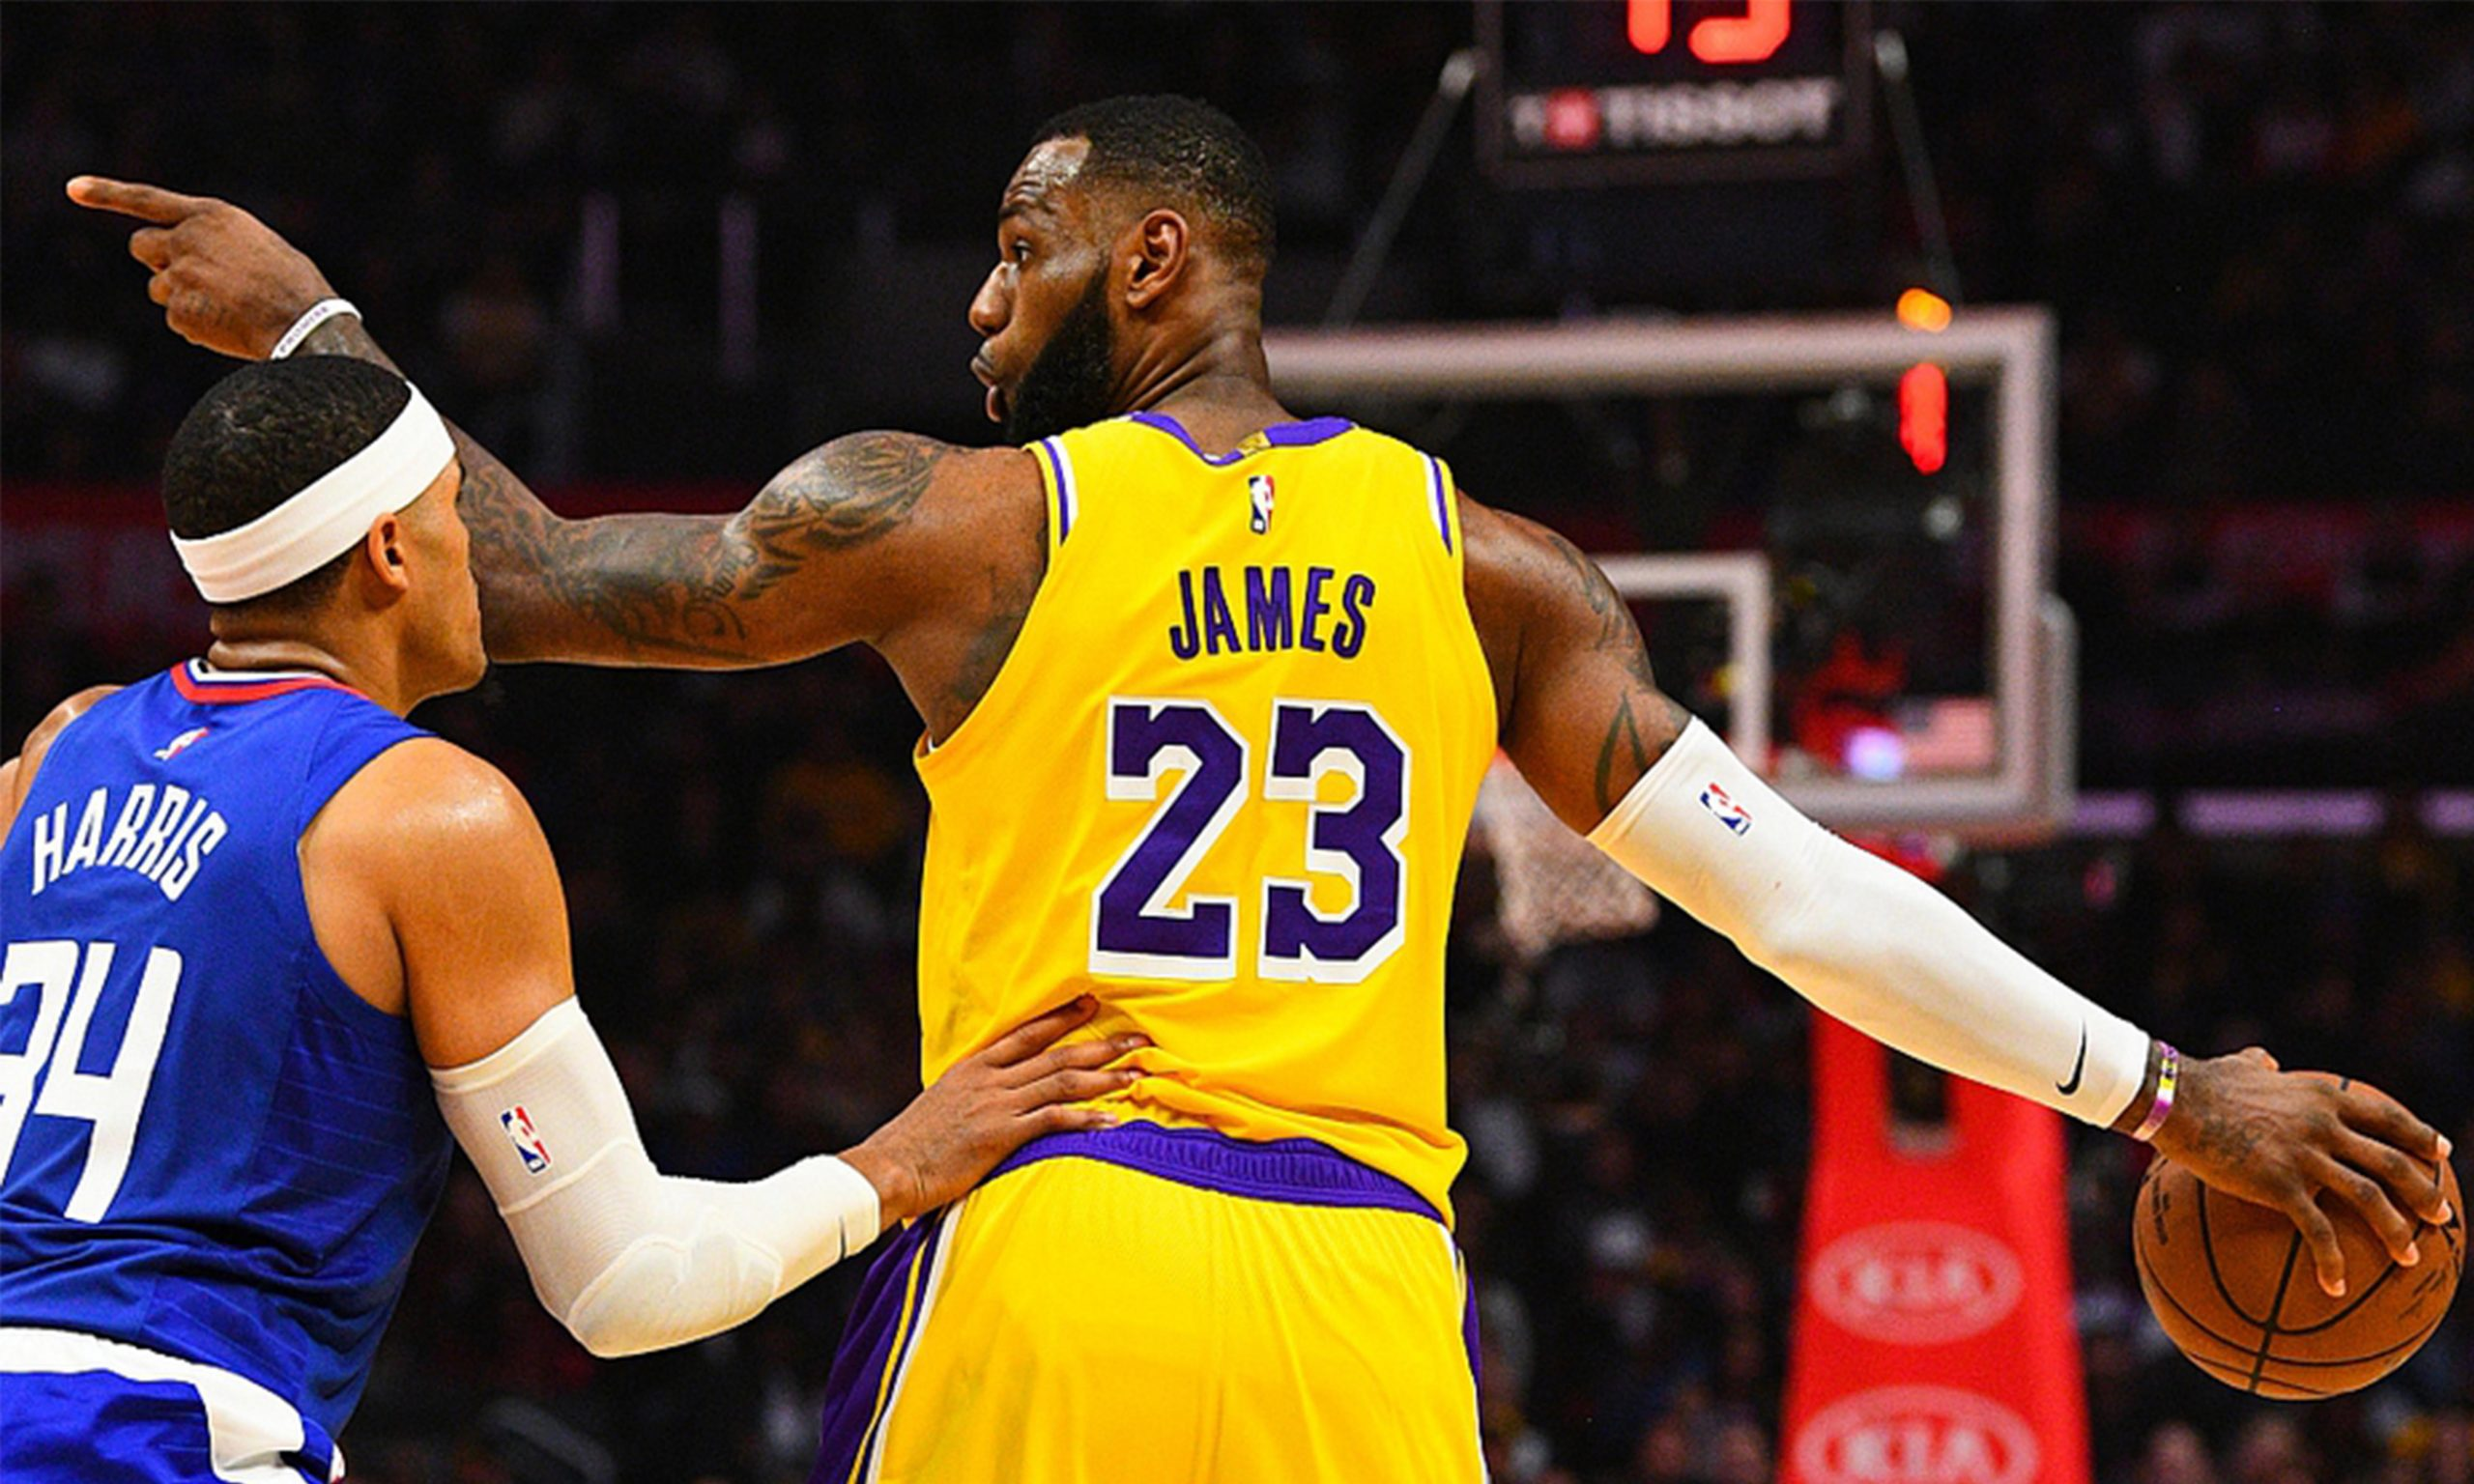 NBA 确认复赛球衣背面文字名单